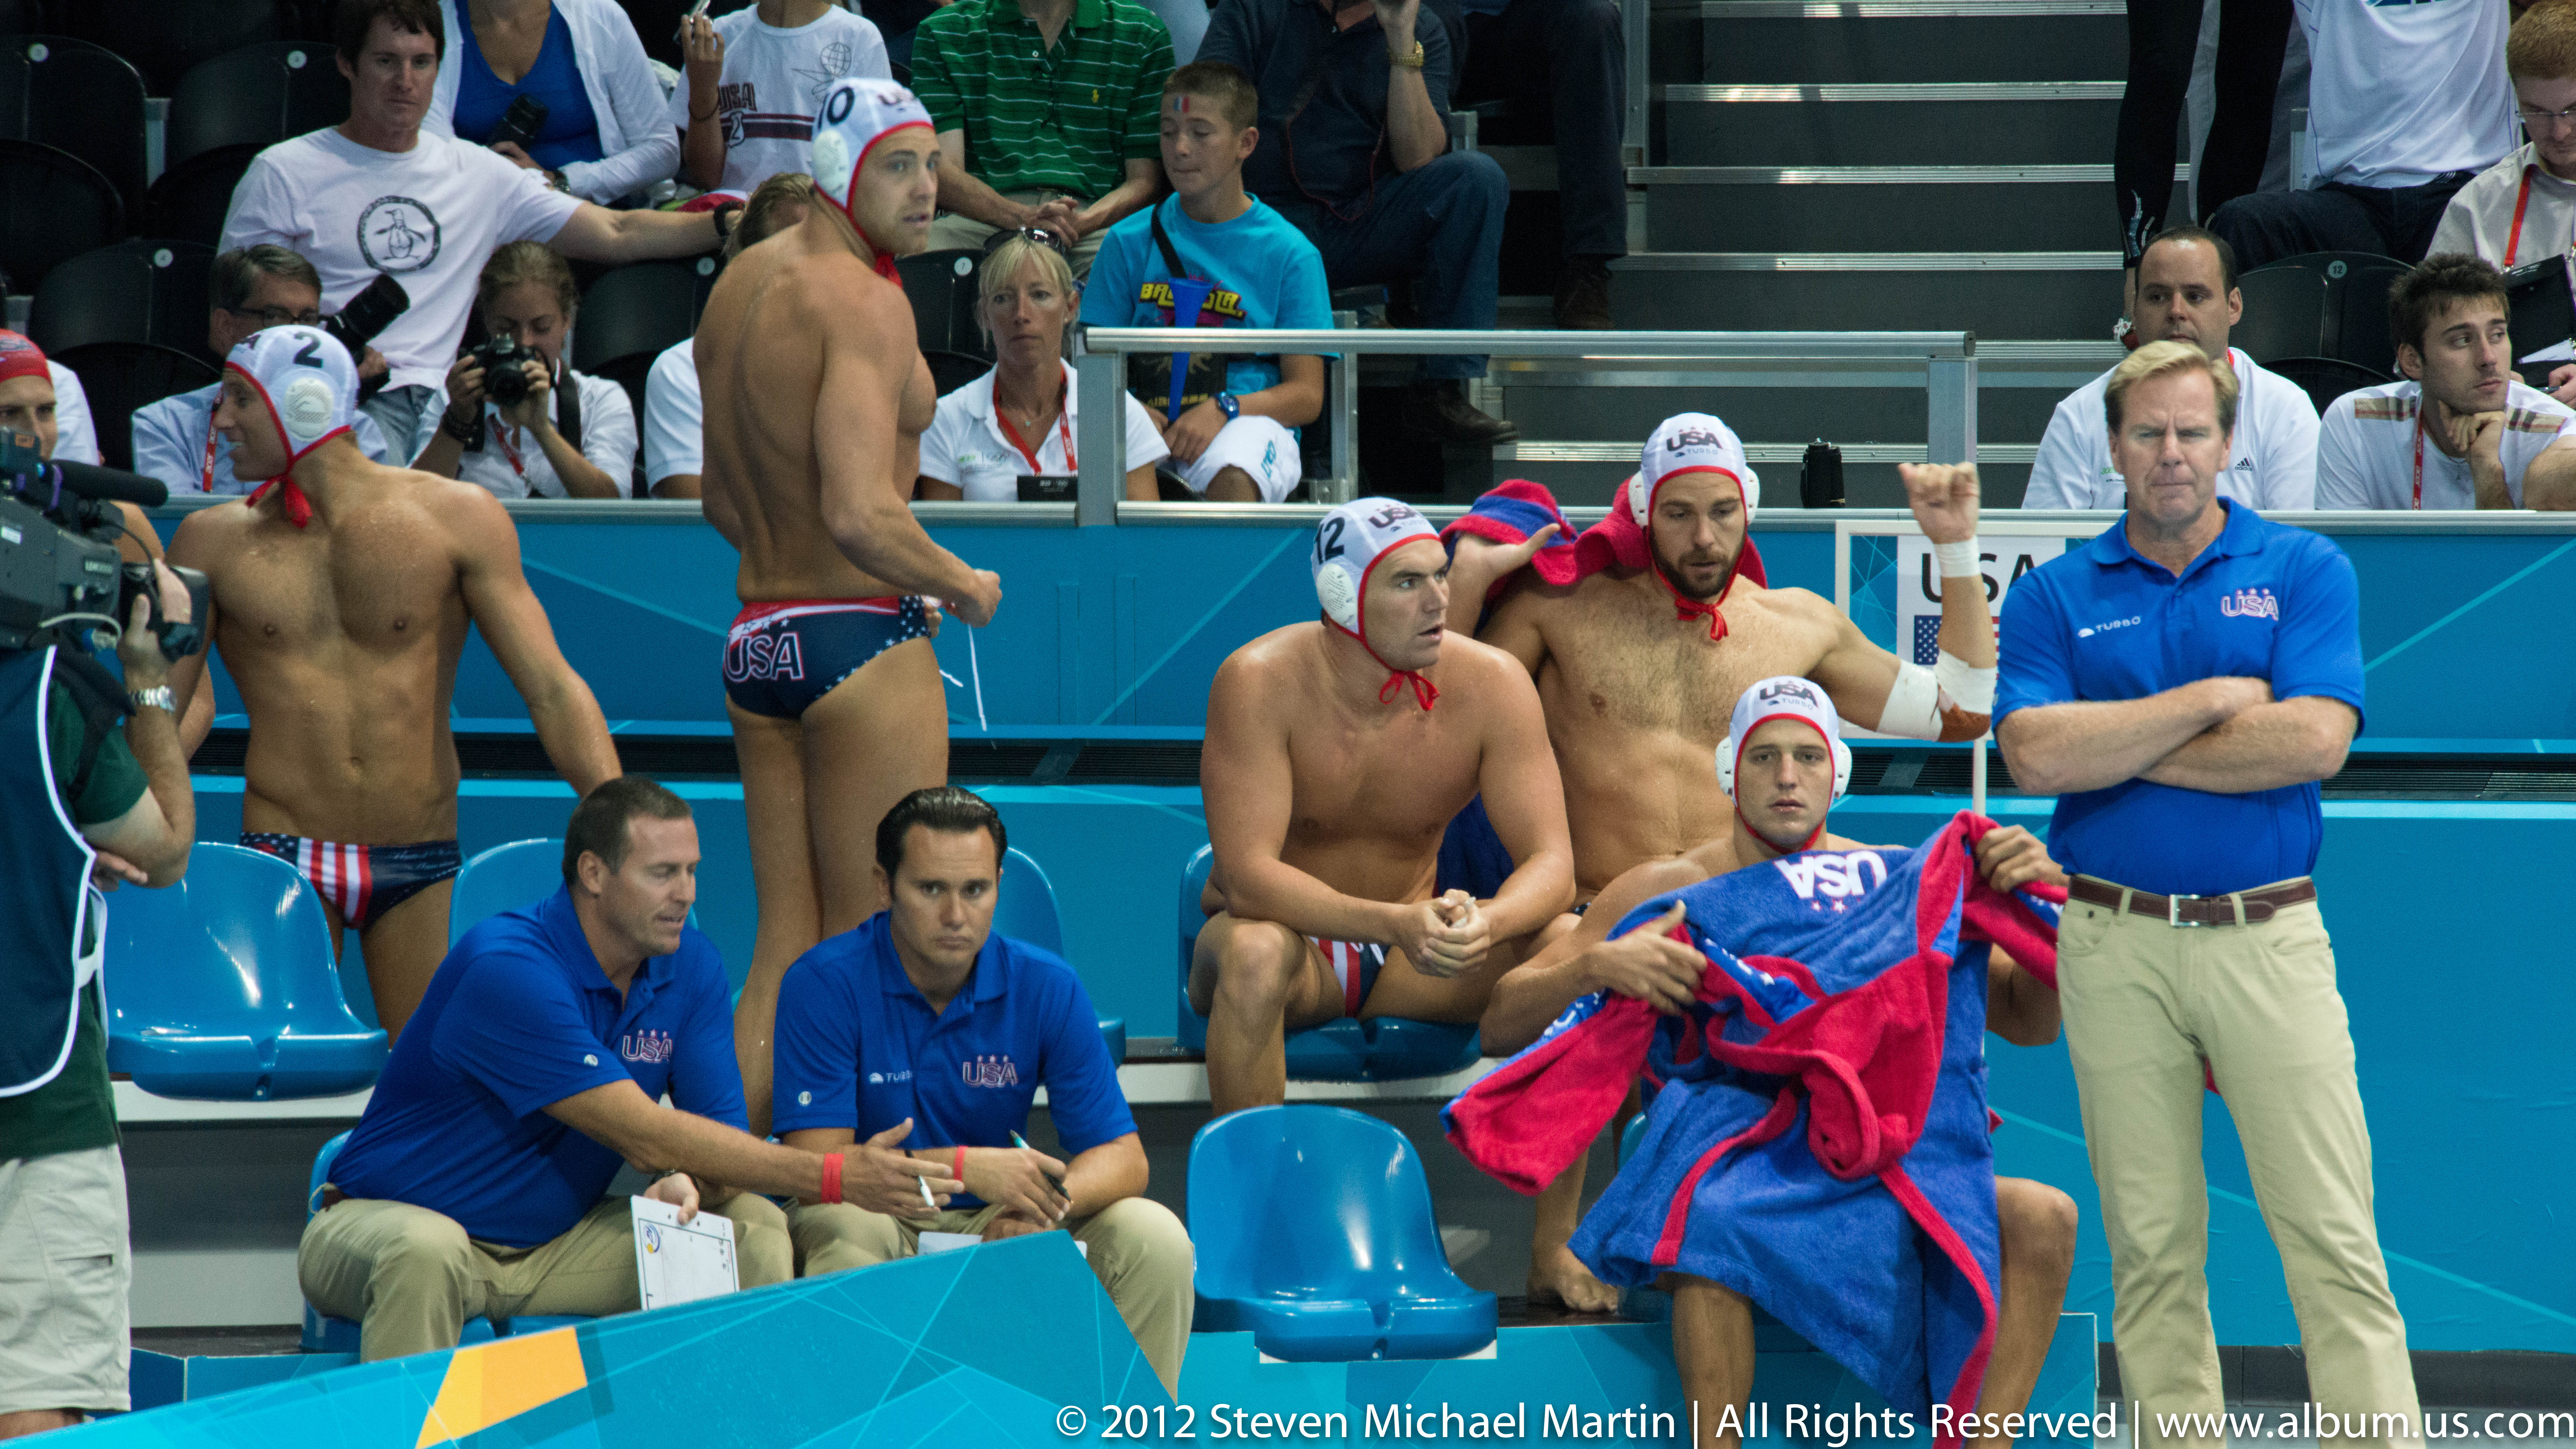 SMartin_2012 Olympics Mens Water Polo_5161046